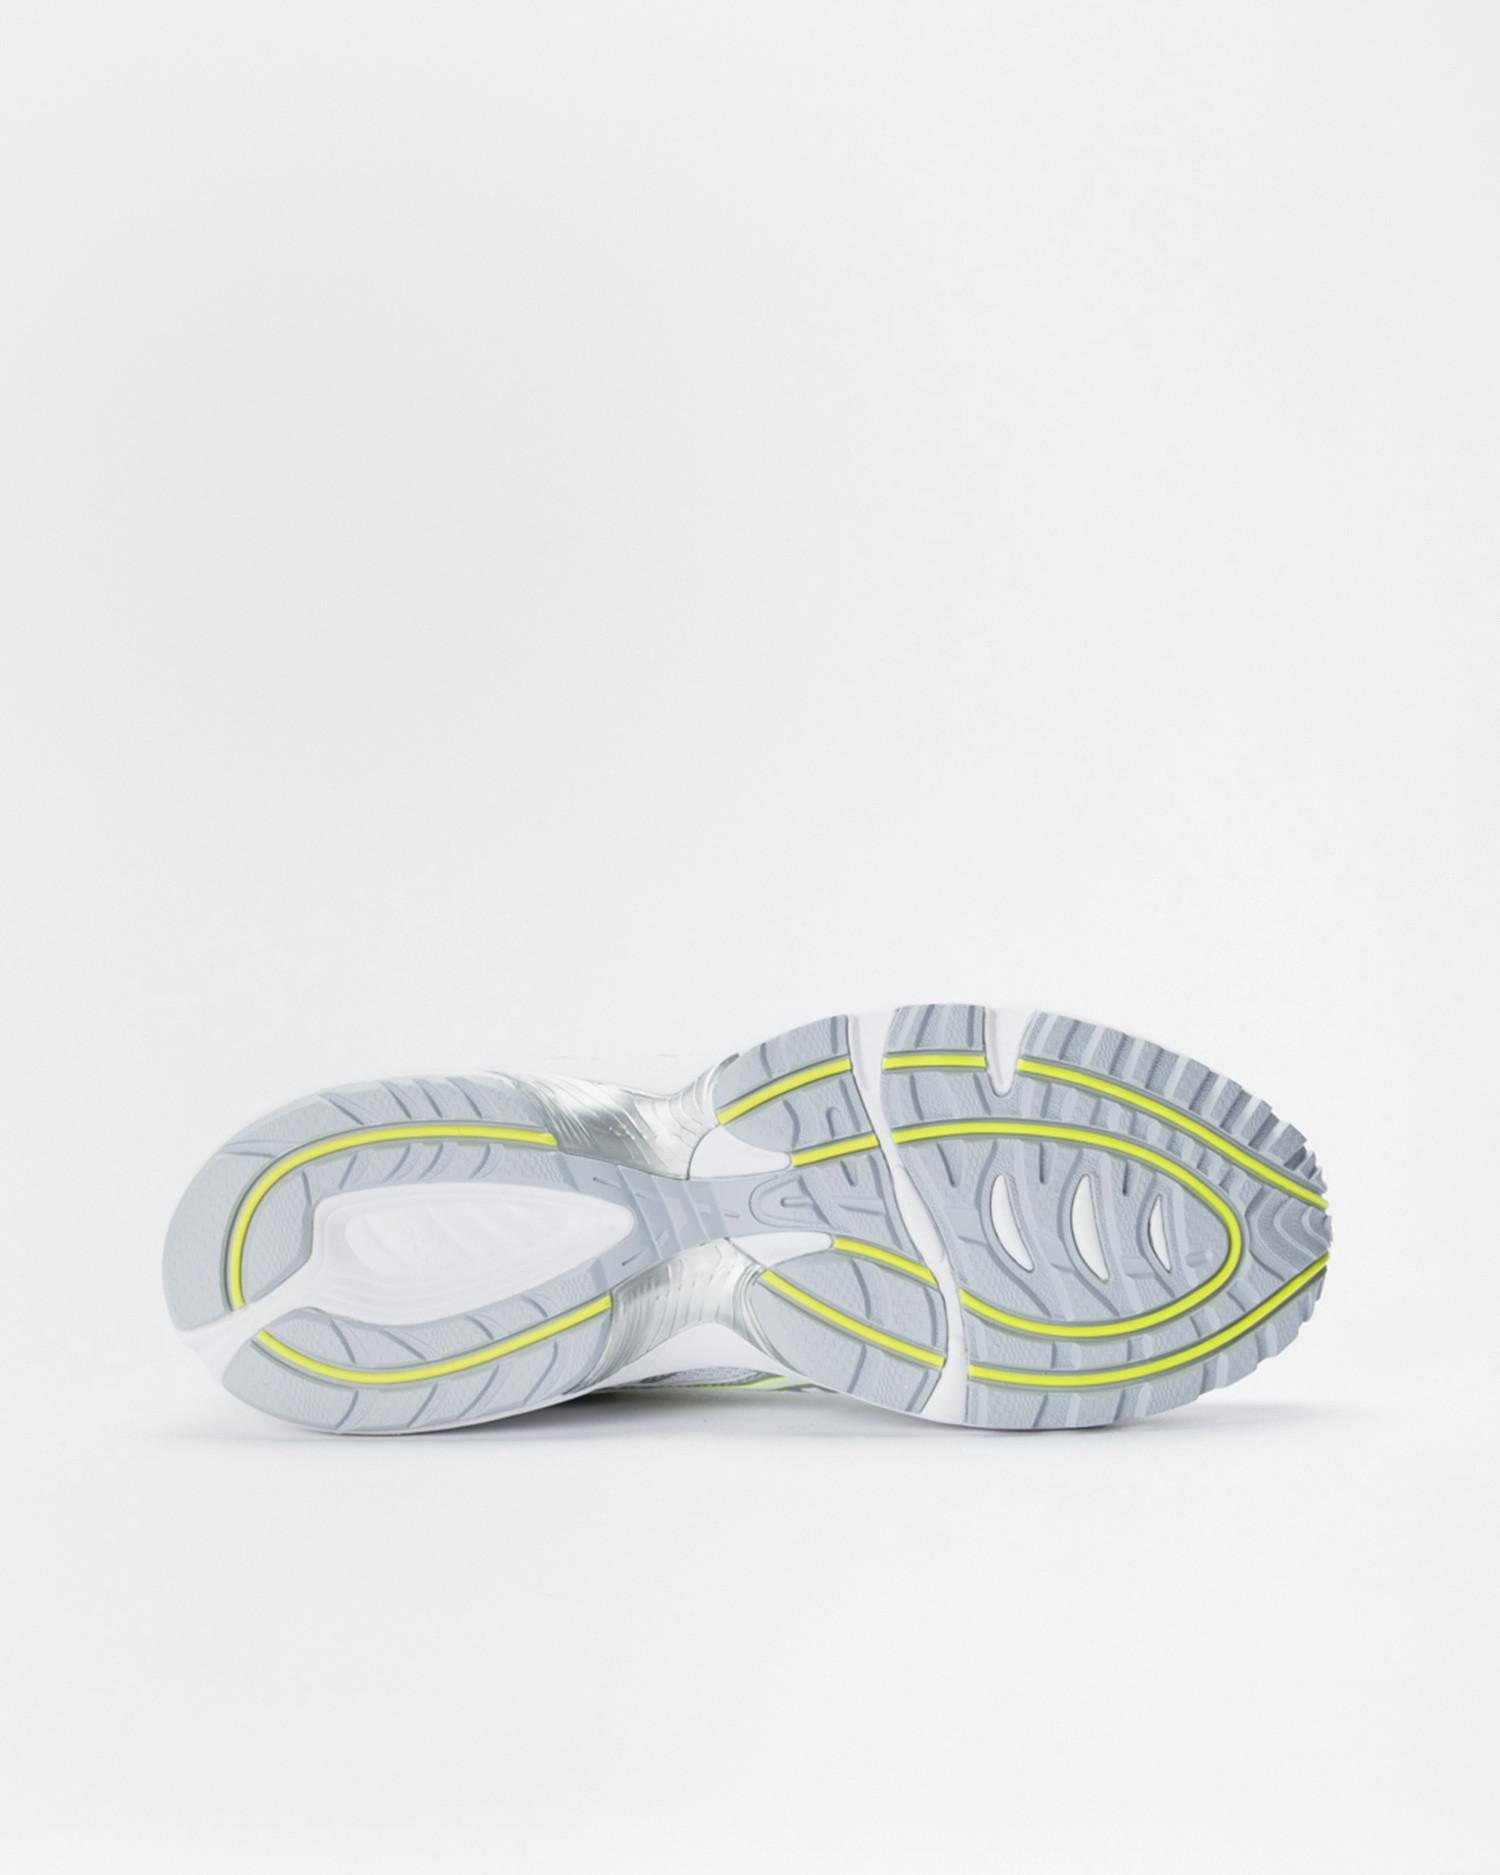 Asics GEL-1090 White/Pure Silver